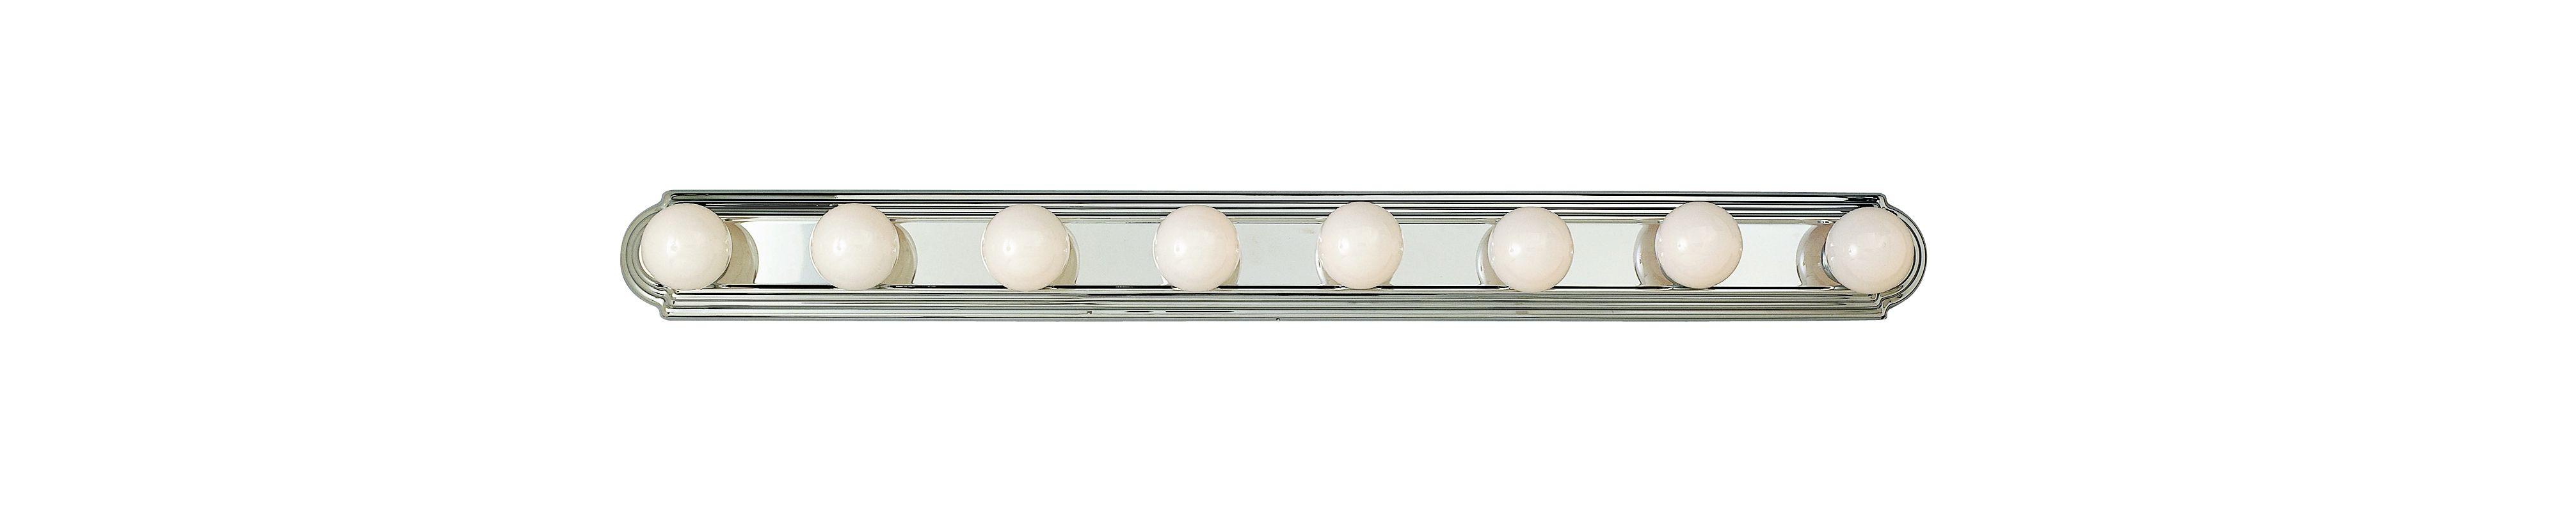 "Trans Globe Lighting 3248 Traditional Eight Light 48"" Wide Bath Bar"